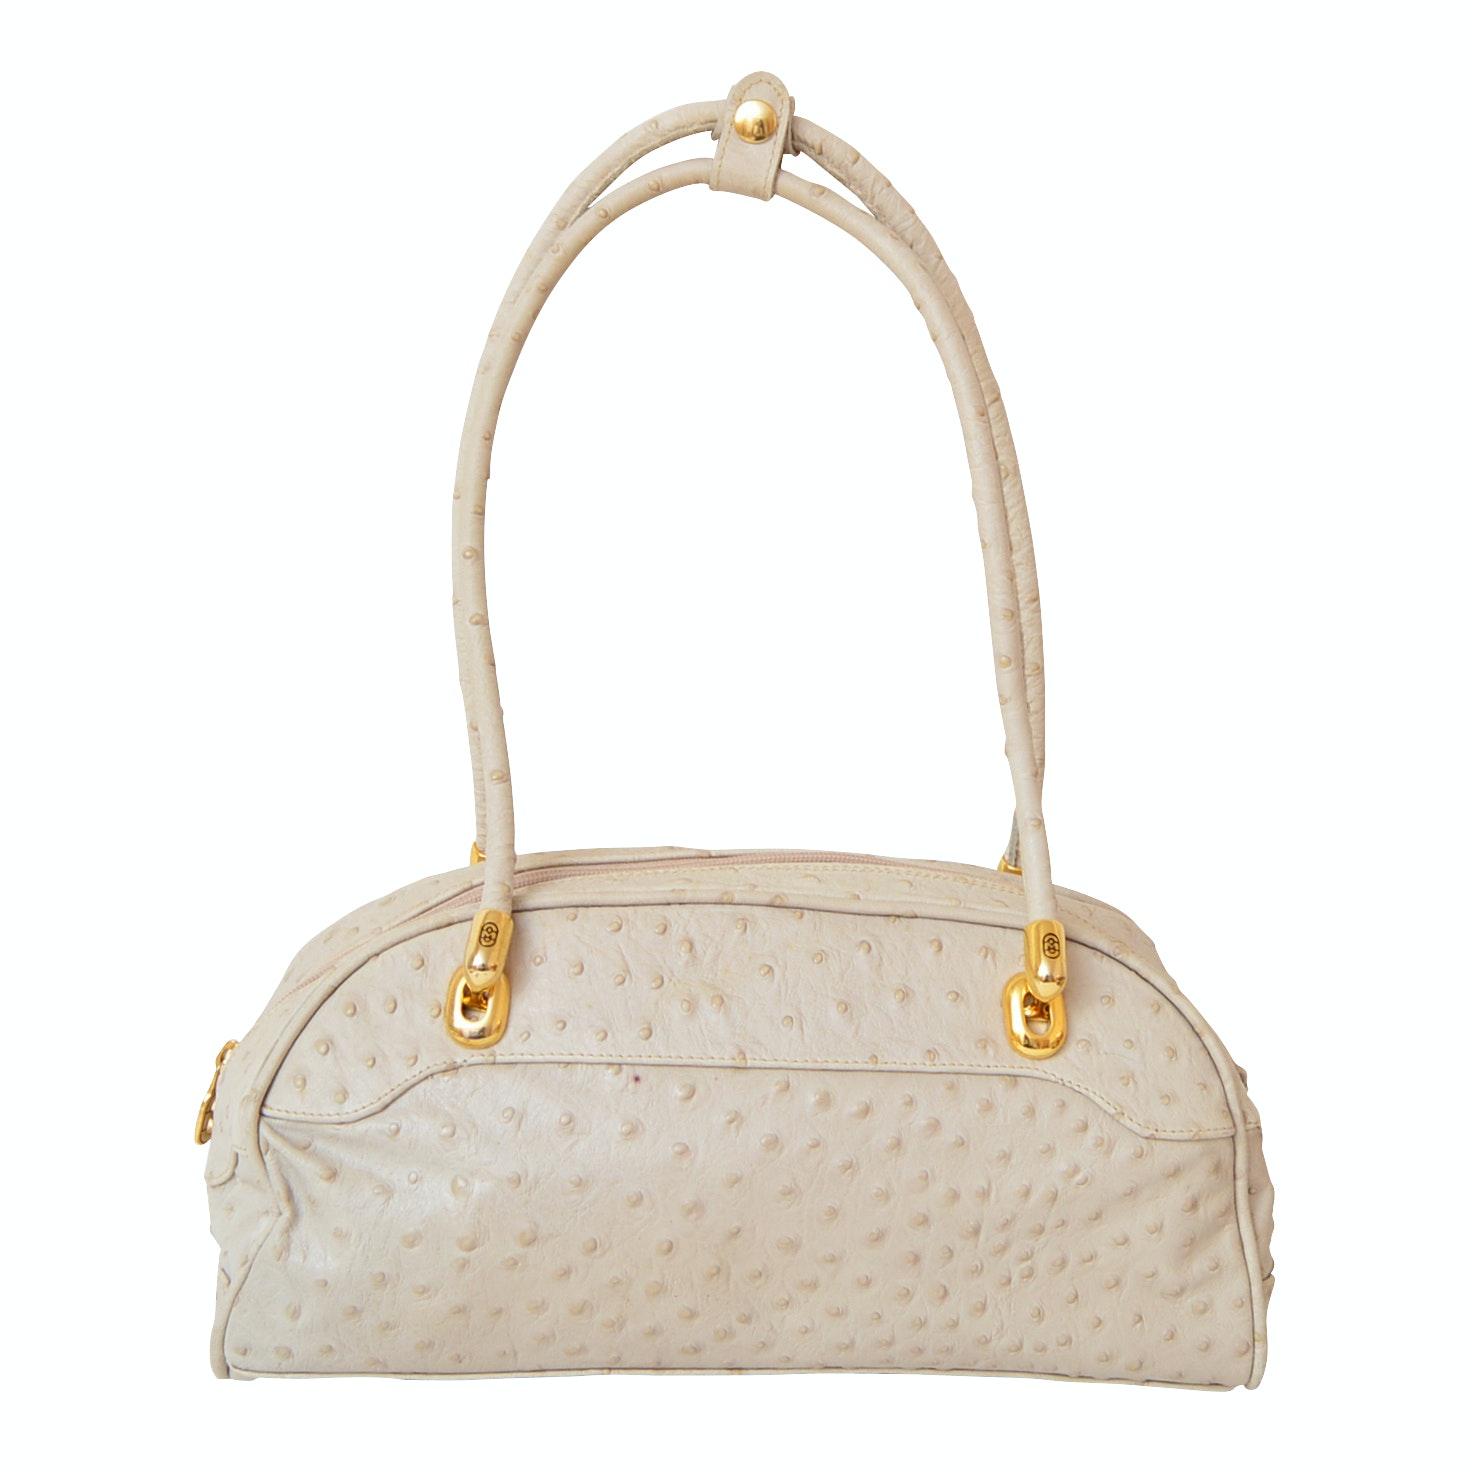 Marino Orlandi Leather Handbag